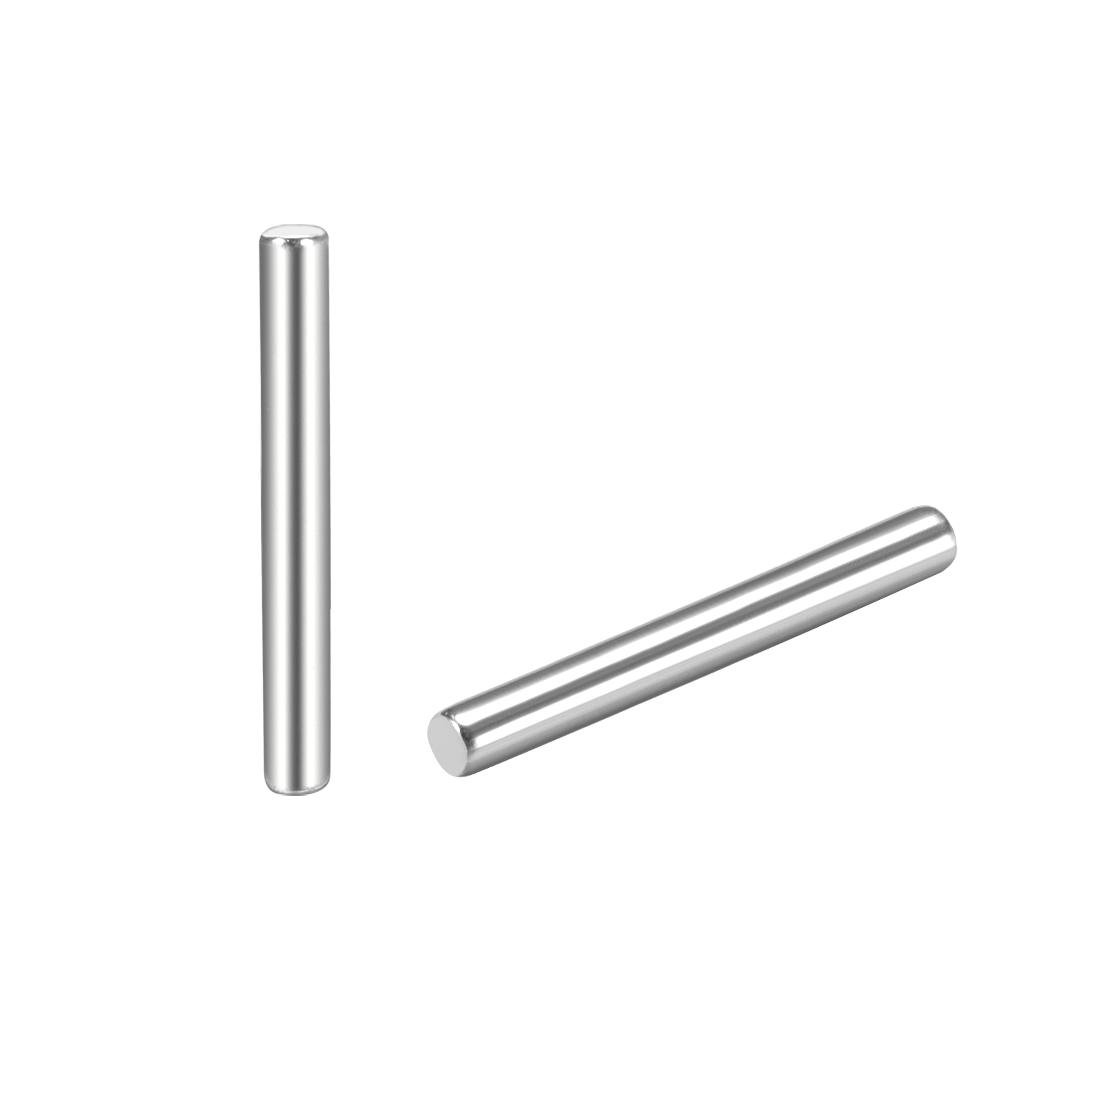 25Pcs 1.5mm x 16mm Dowel Pin 304 Stainless Steel Shelf Support Pin Fasten